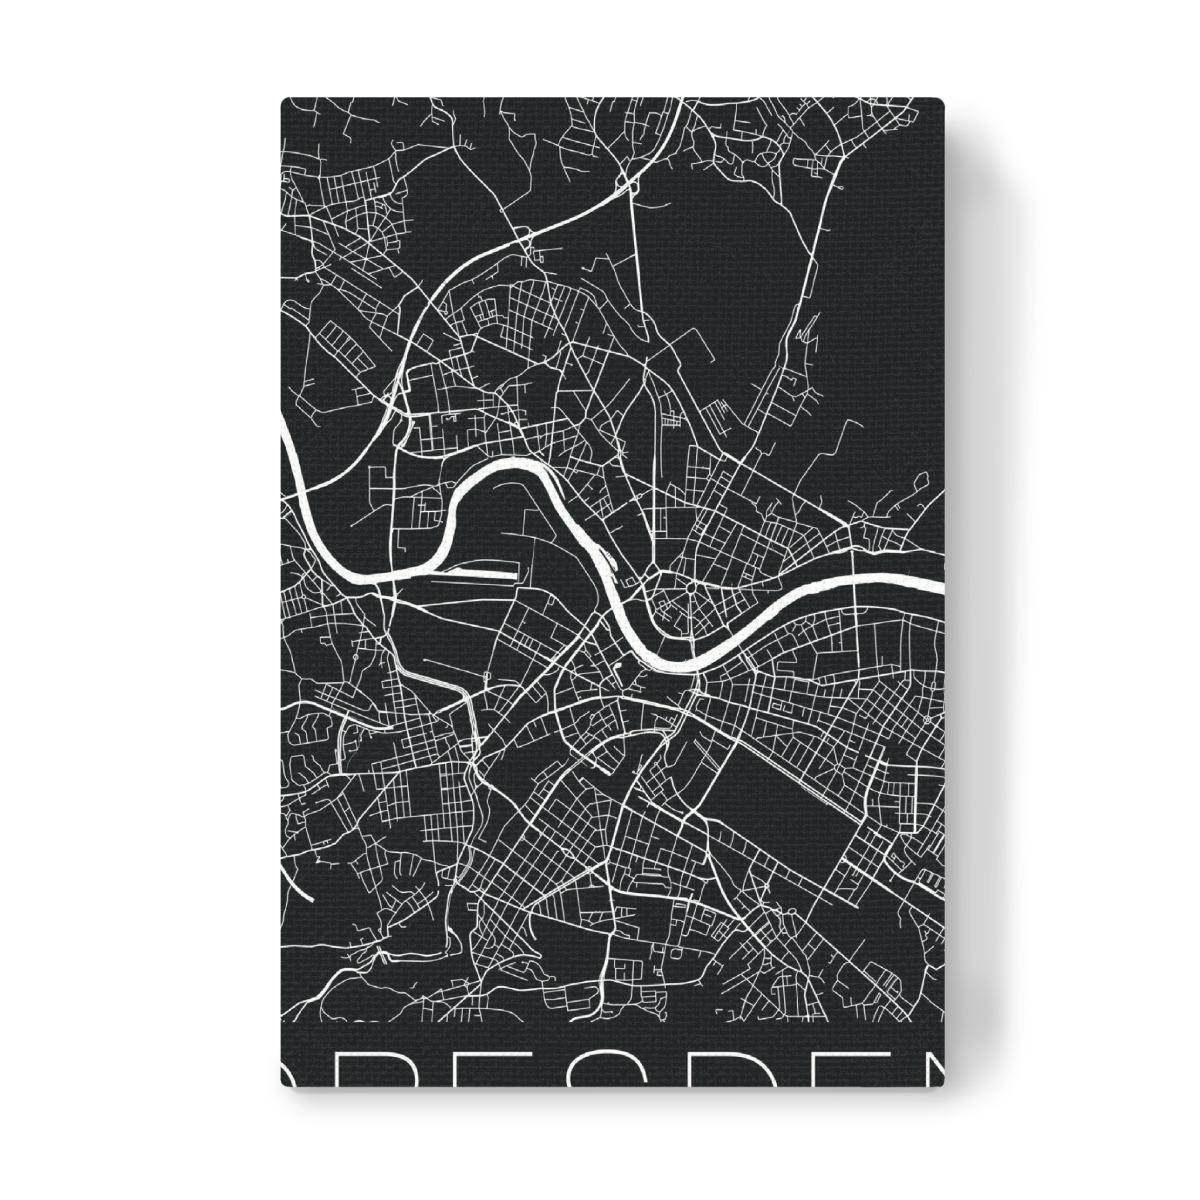 Retro Map Dresden Germany als Leinwand bei artboxONE kaufen on